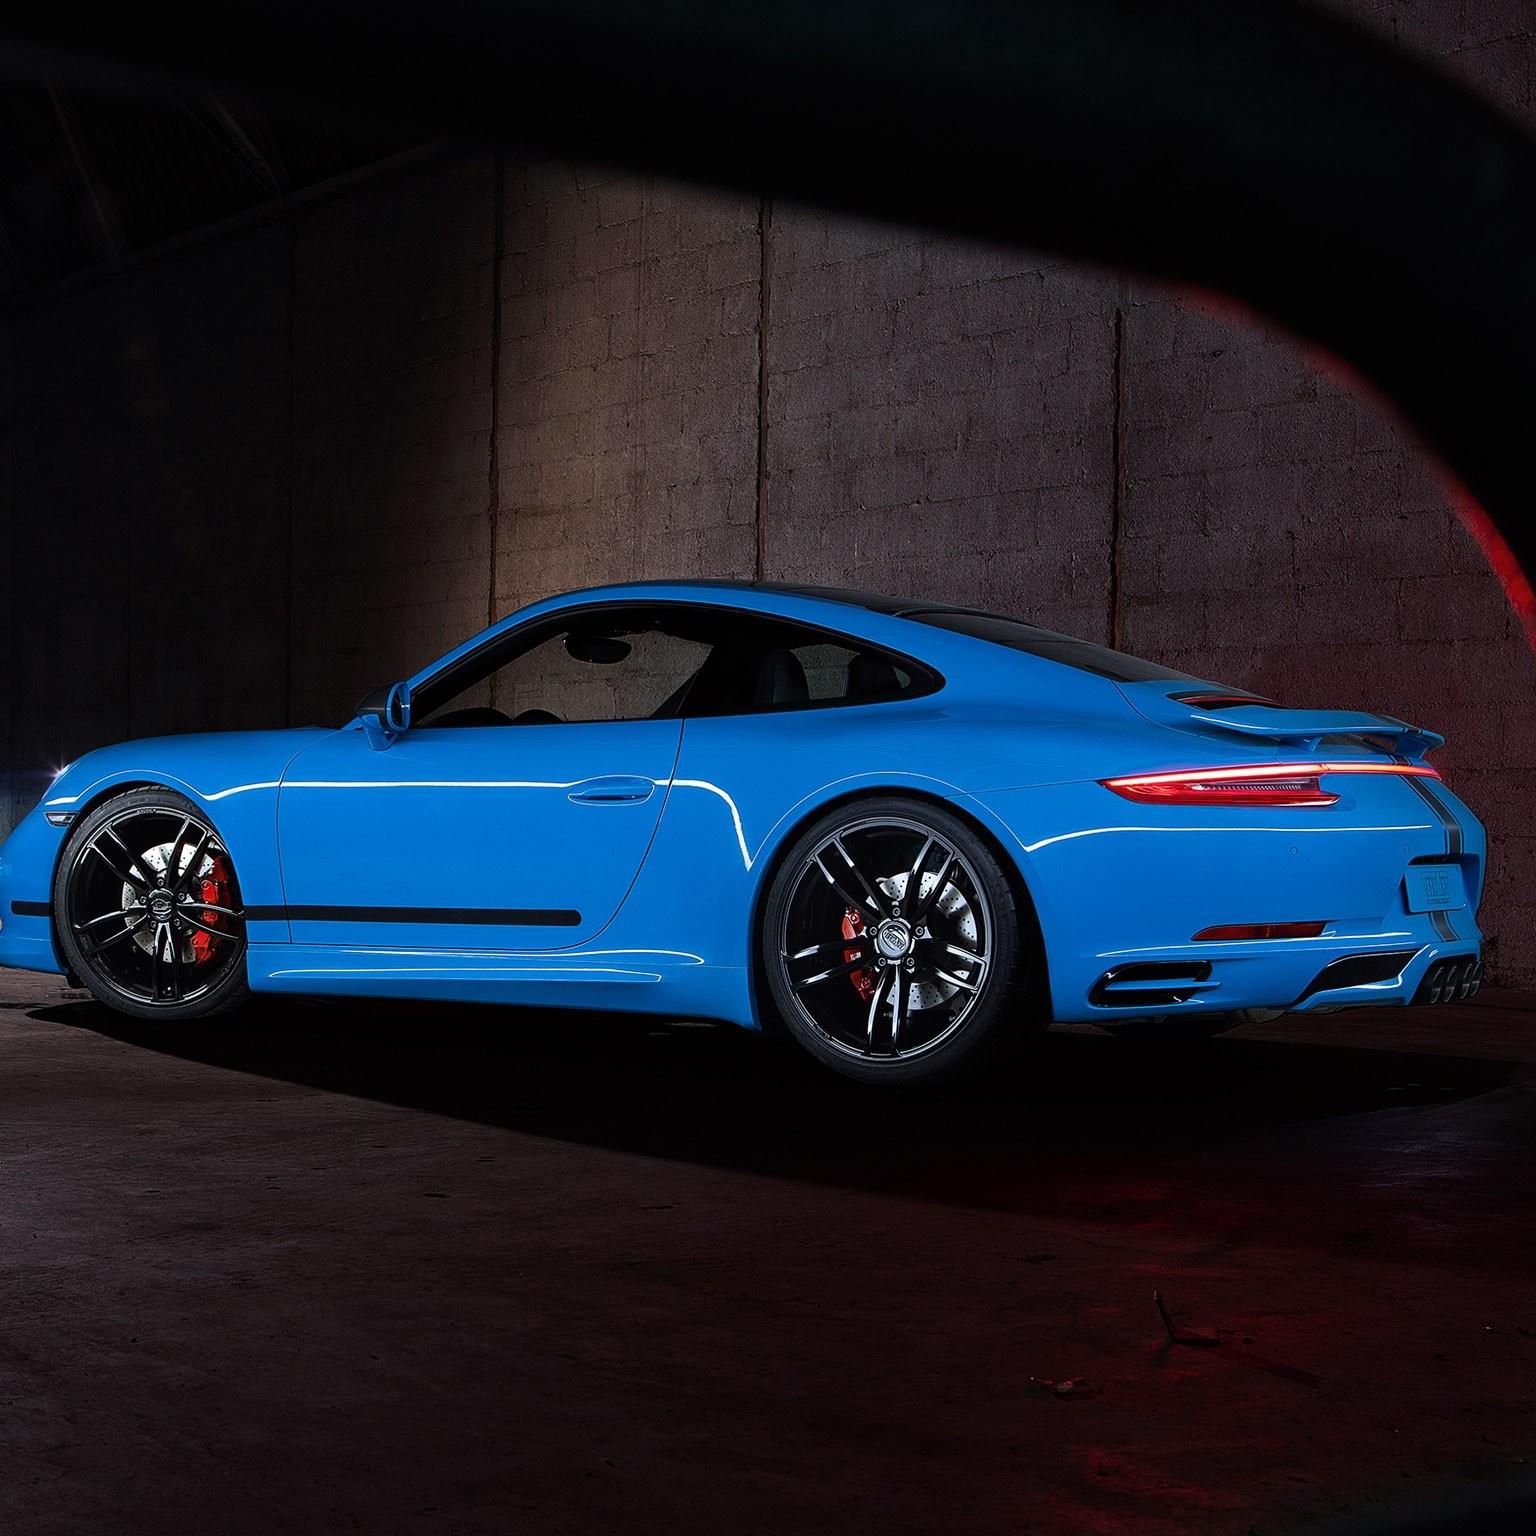 2016 Techart Porsche 911 Carrera 4s Coupe 991